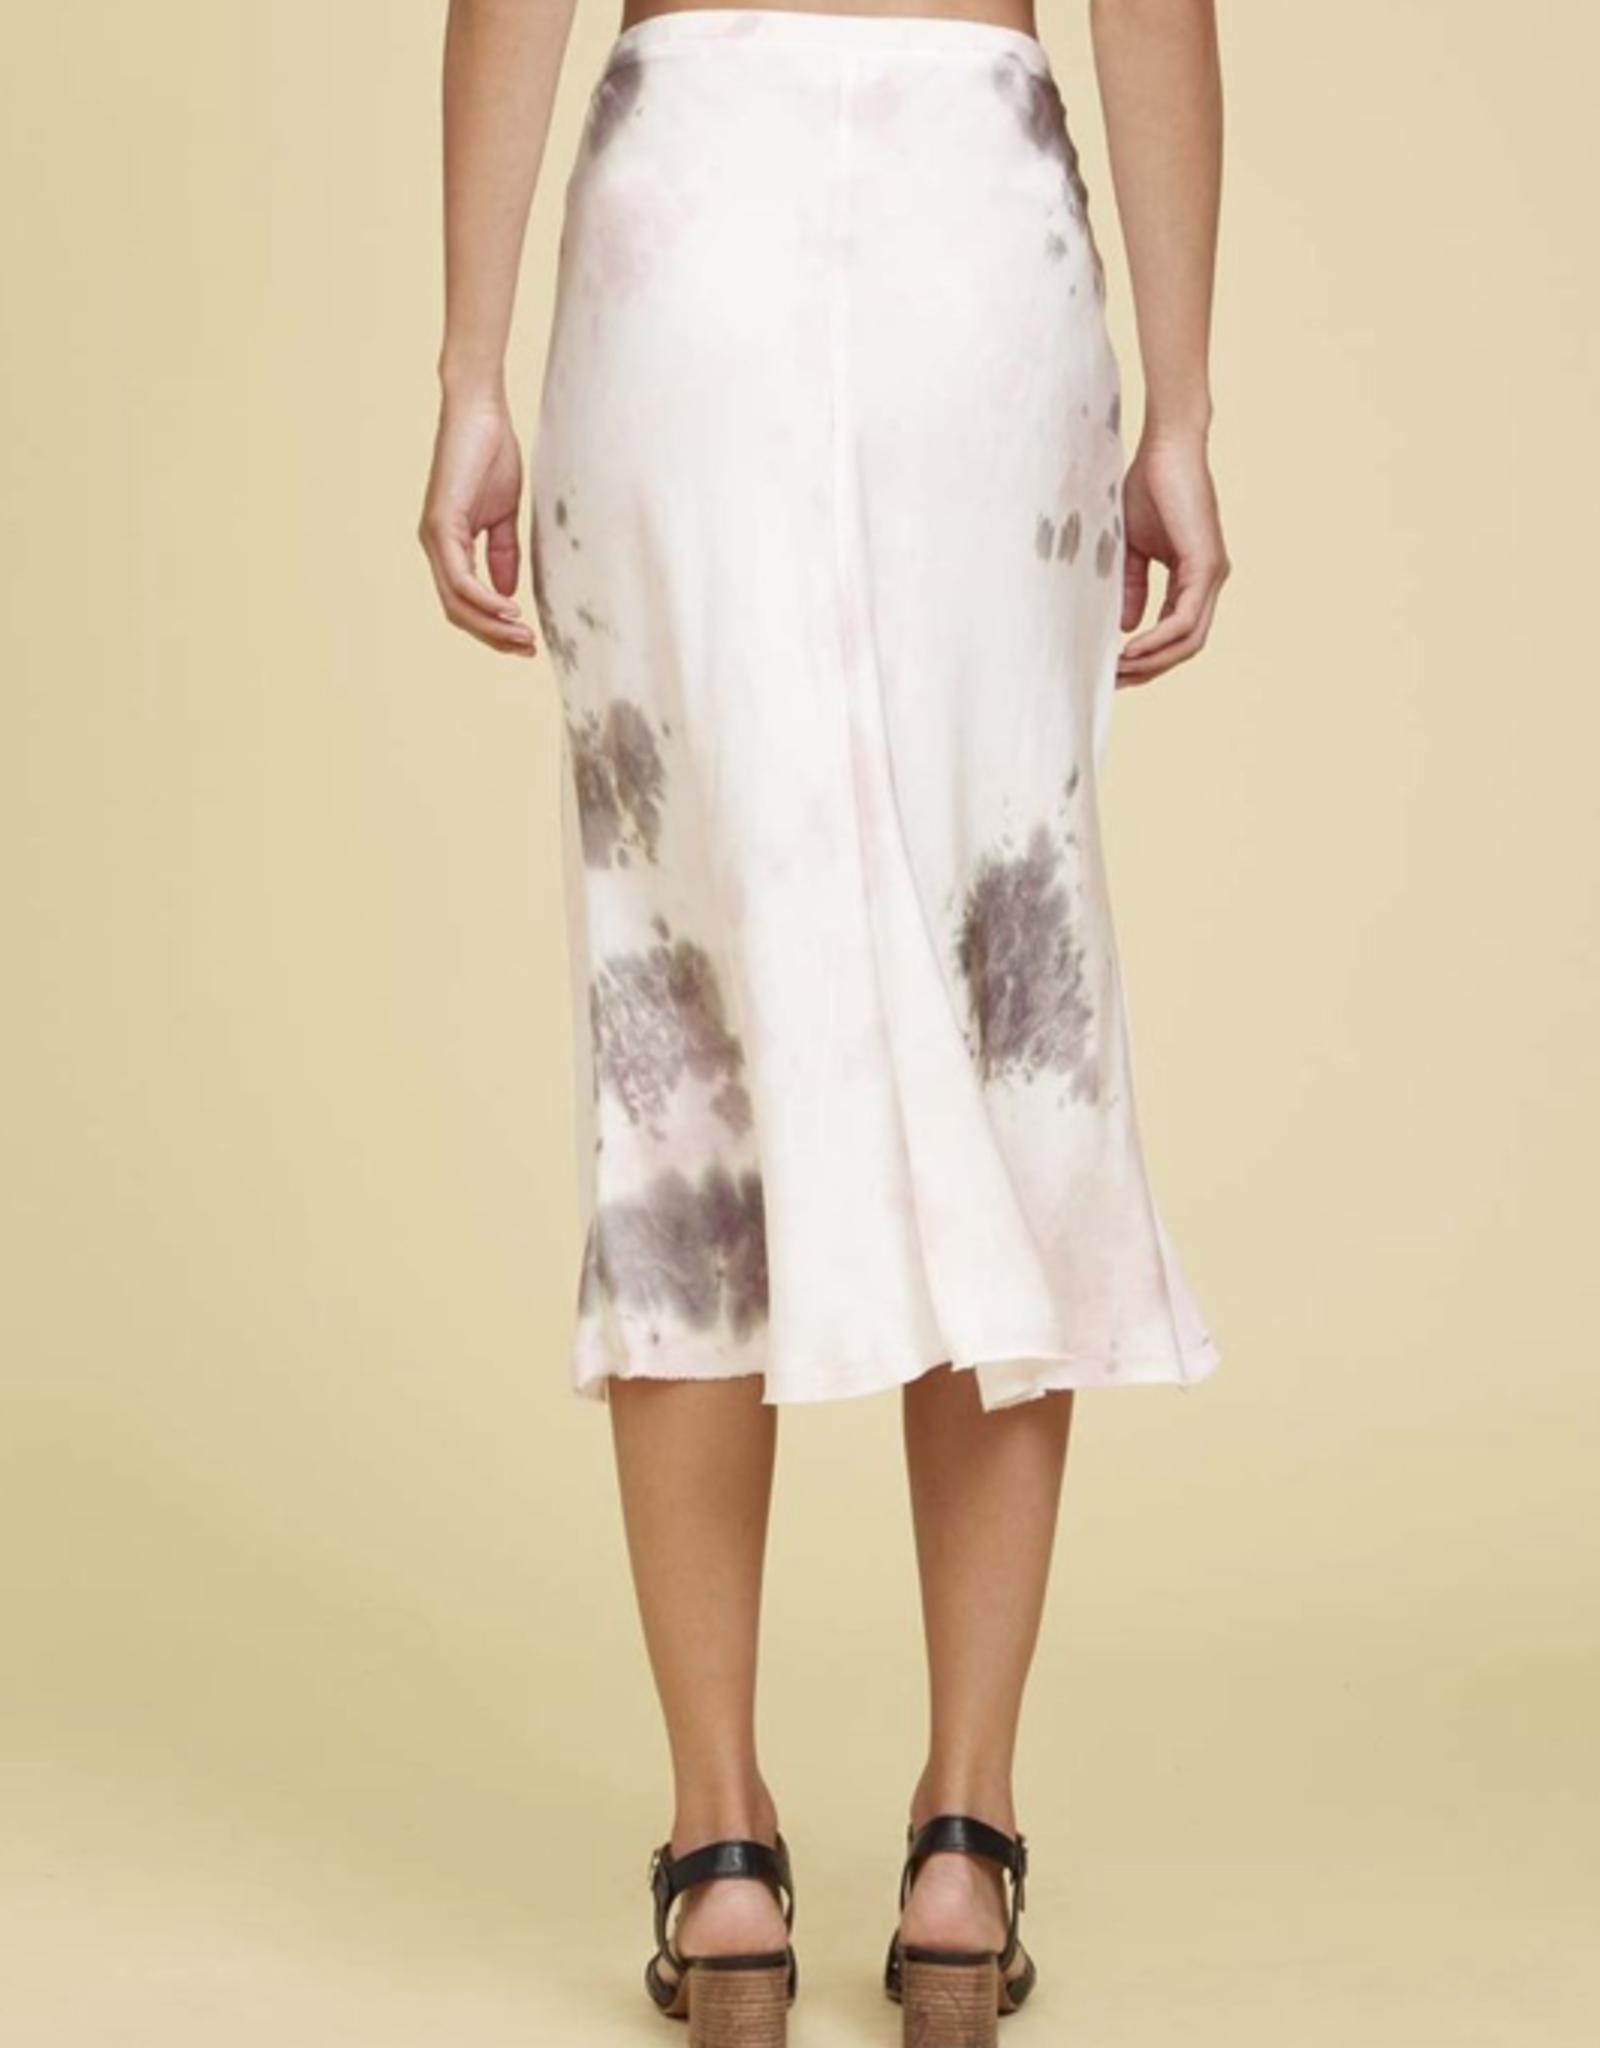 Skirt NATION LTD - Mabel Bias Cut Skirt in Pink Moon